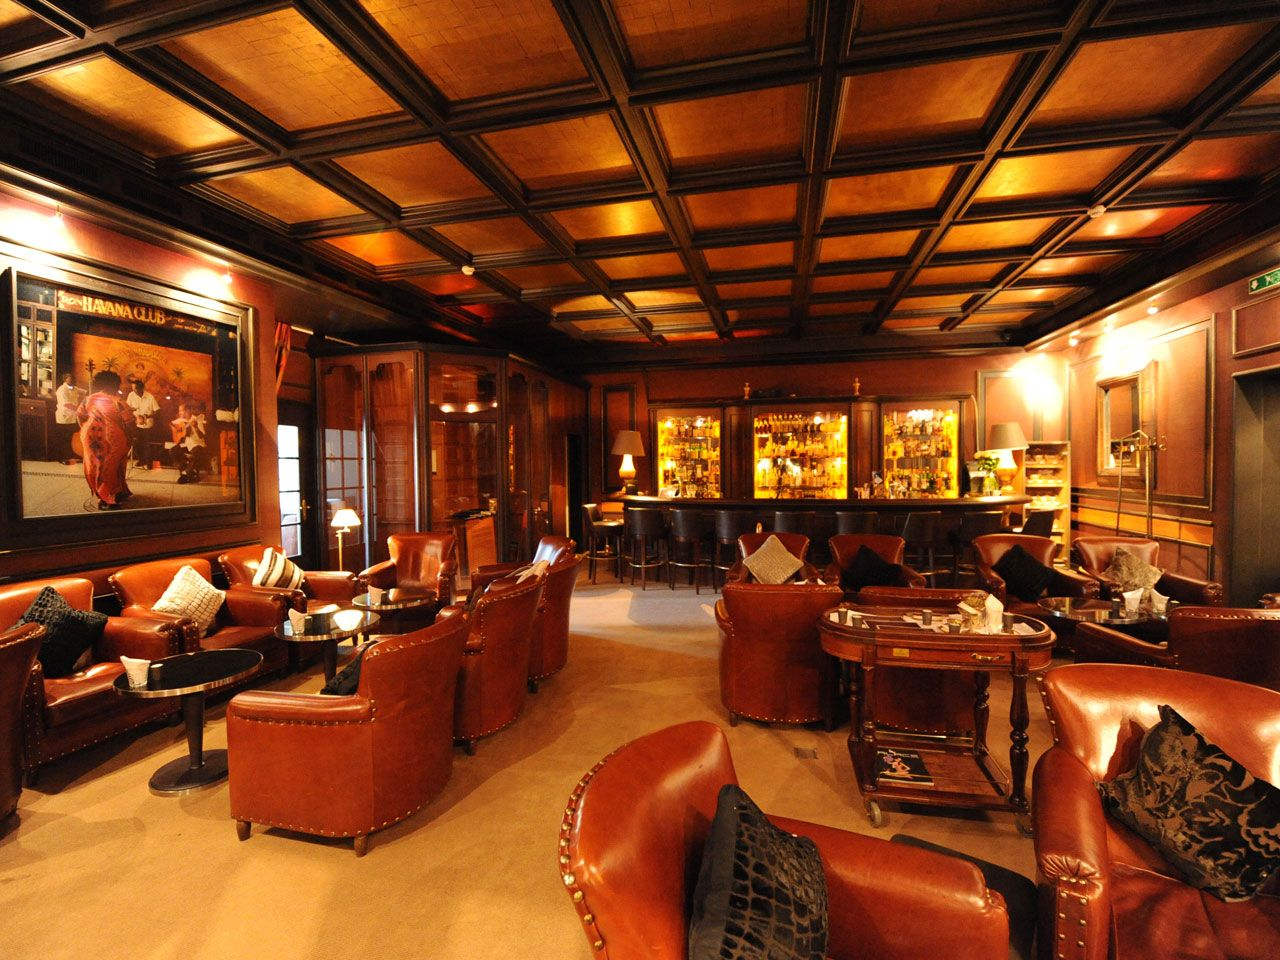 Cigar Lounge / Bar | D E N H E R R E K L U B B | Pinterest ...